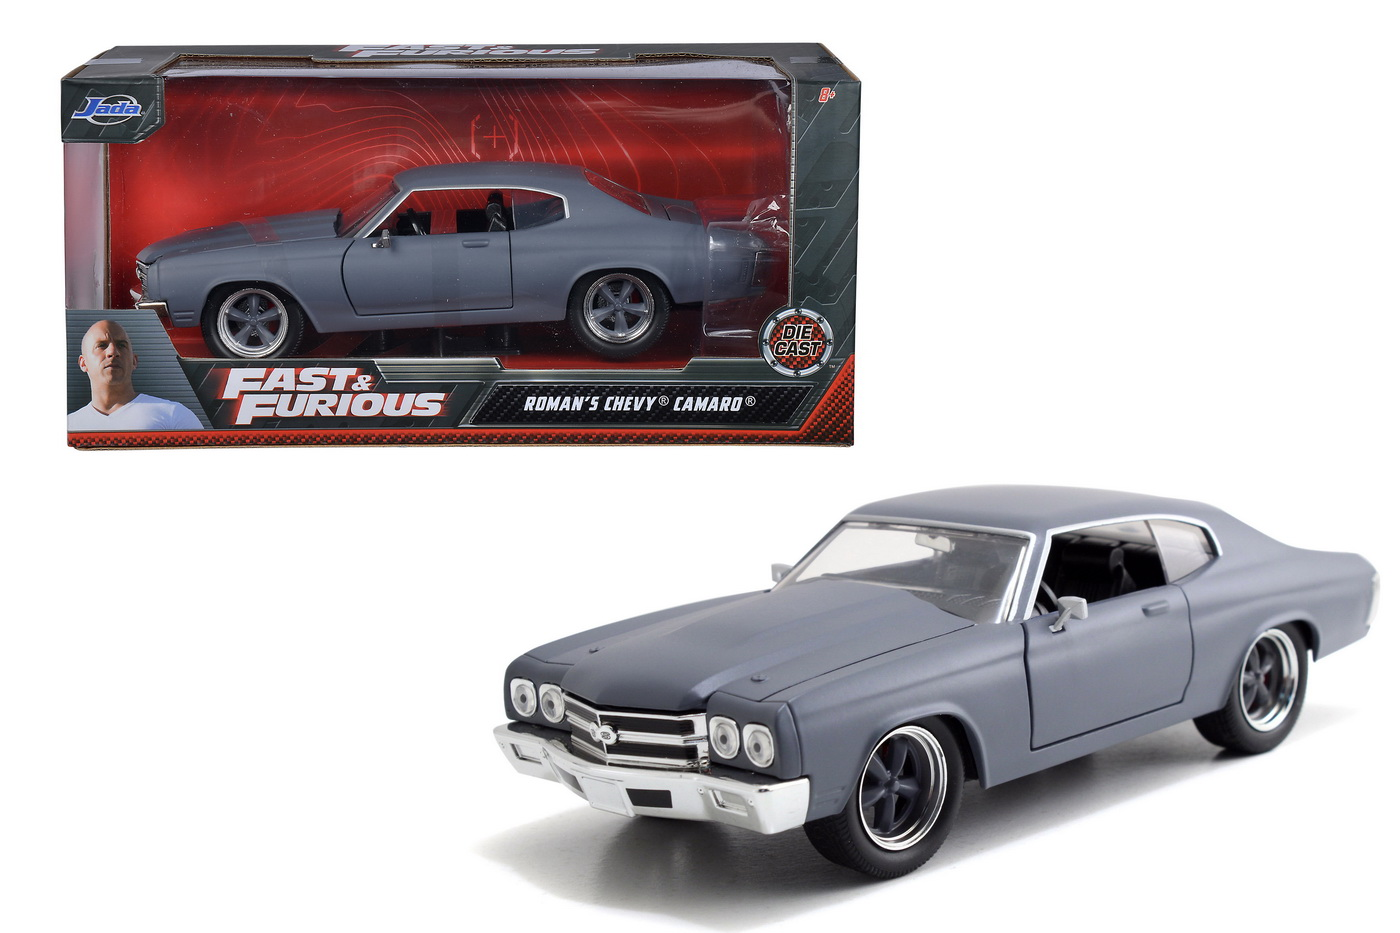 Masinuta Metalica Fast And Furious Roman's Chevy Camaro Scara 1:24